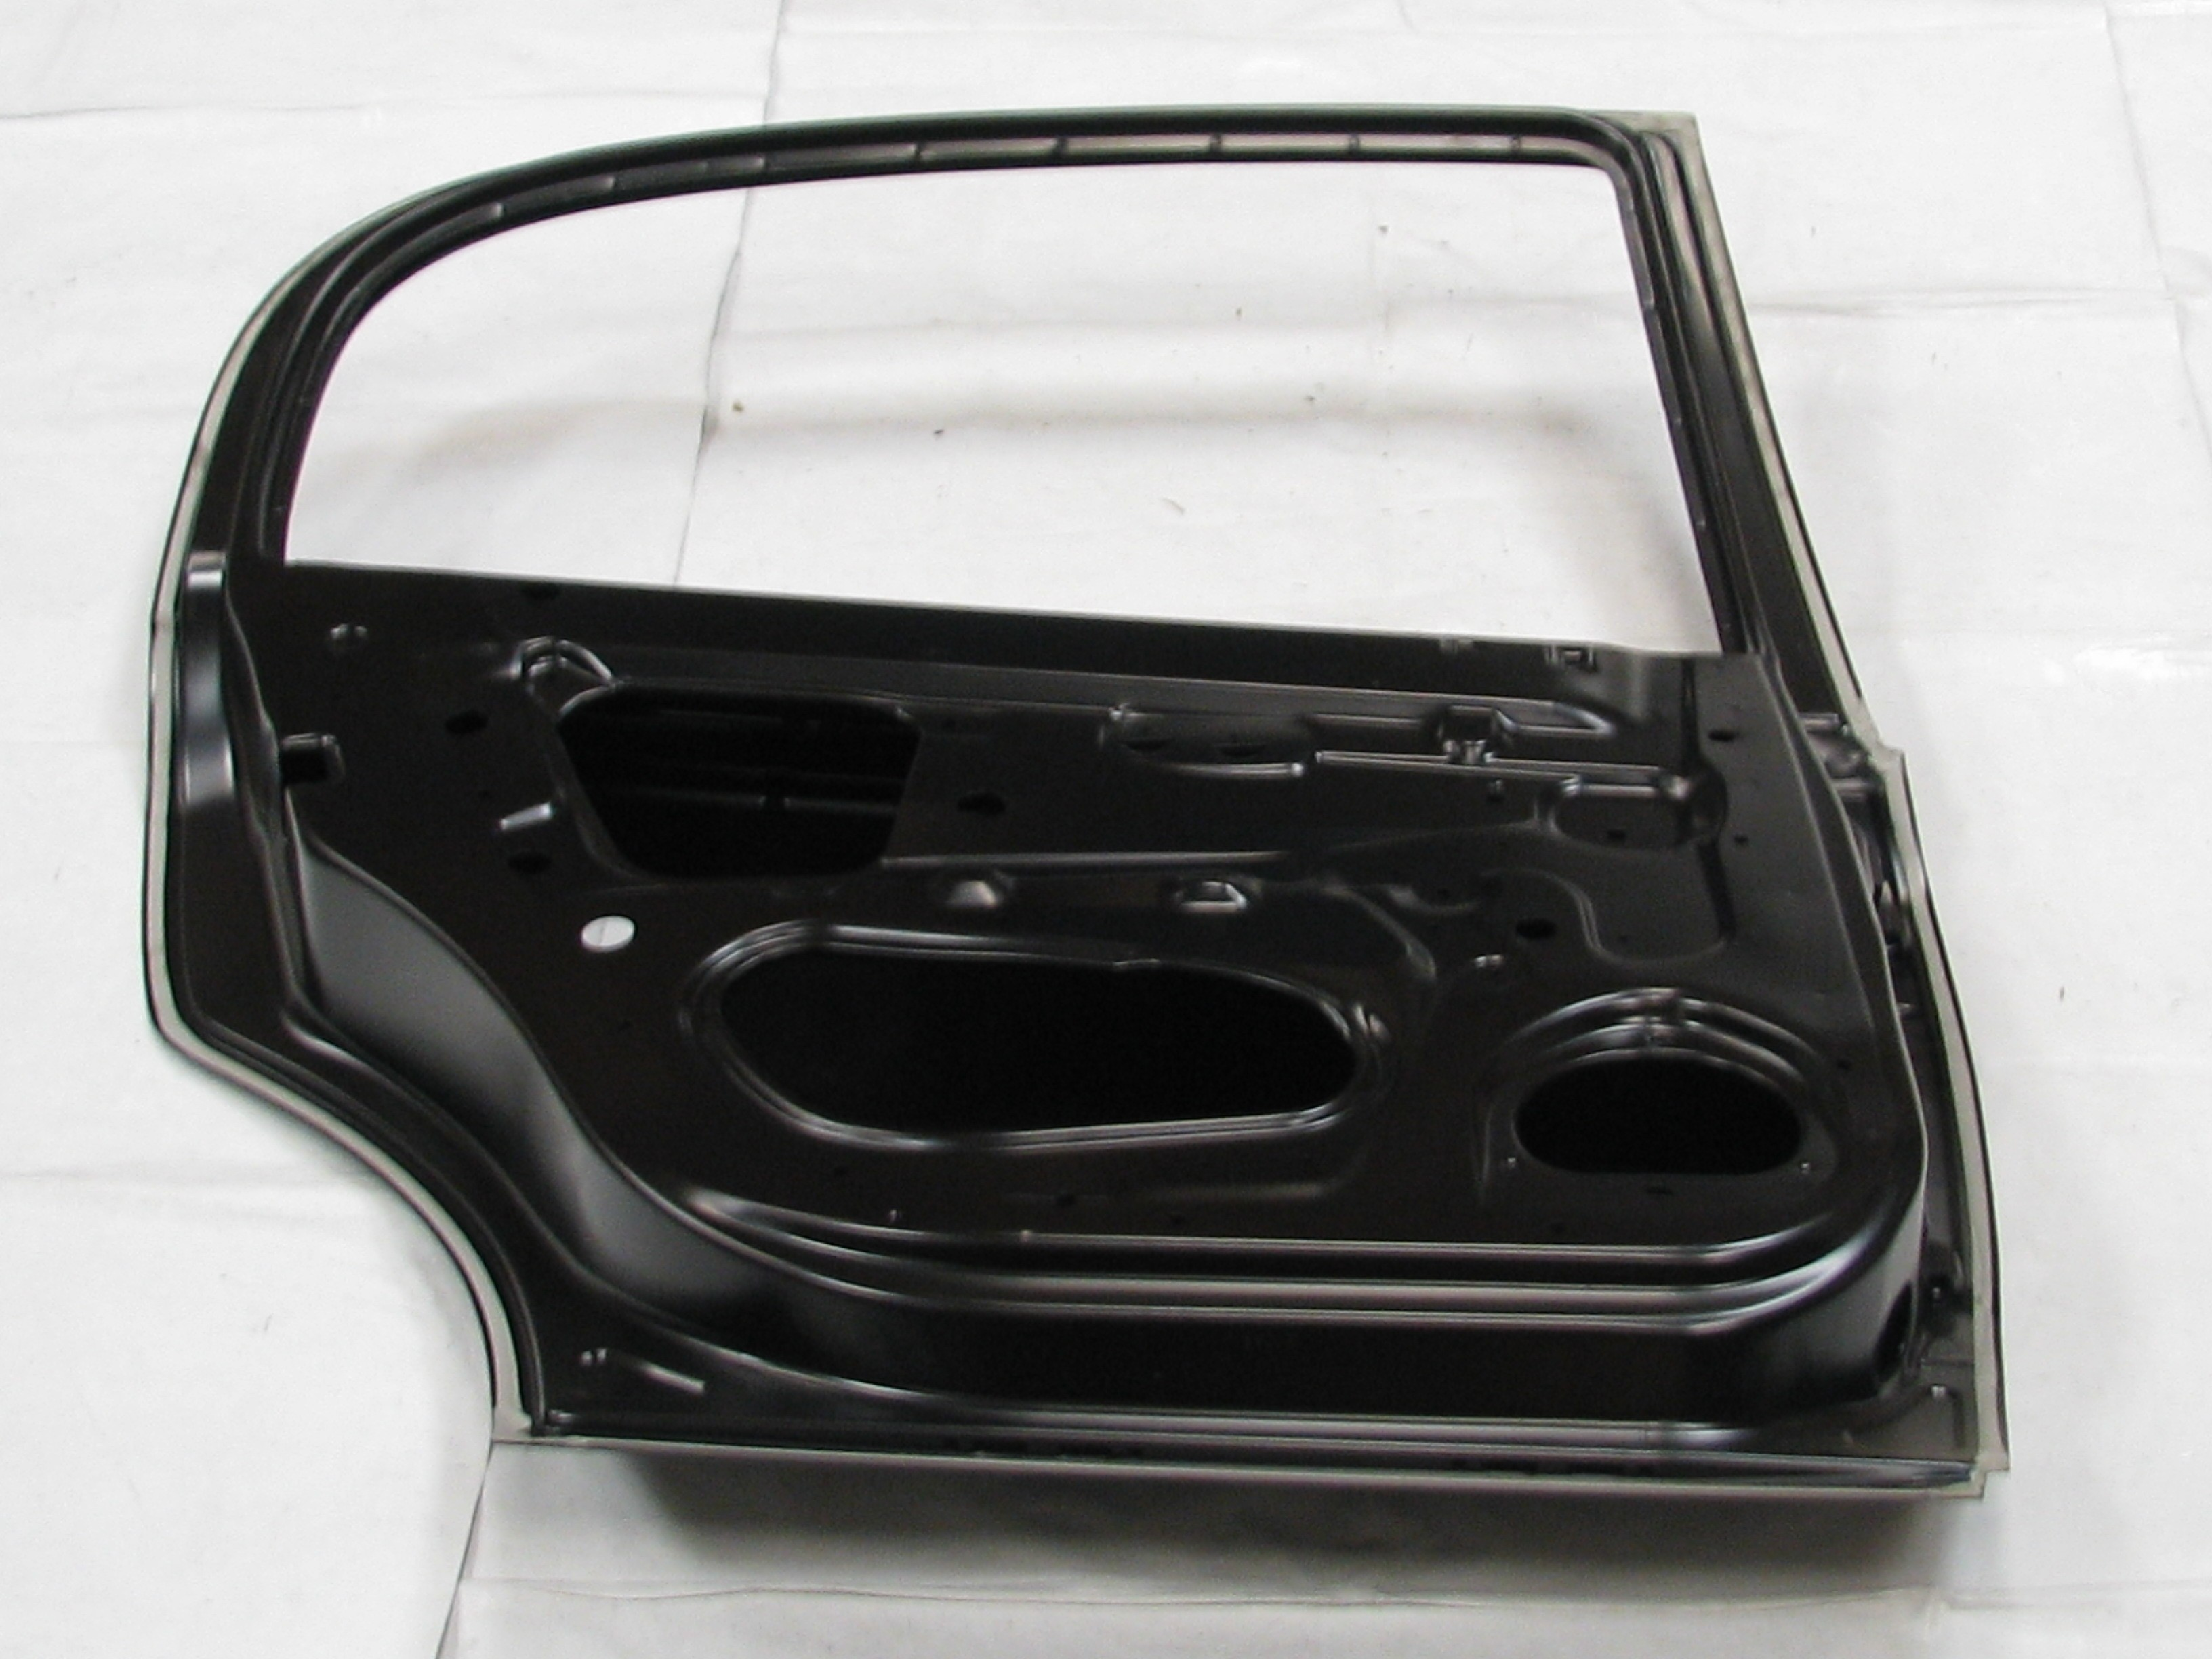 & Vauxhall Astra G Passenger Side Rear Door